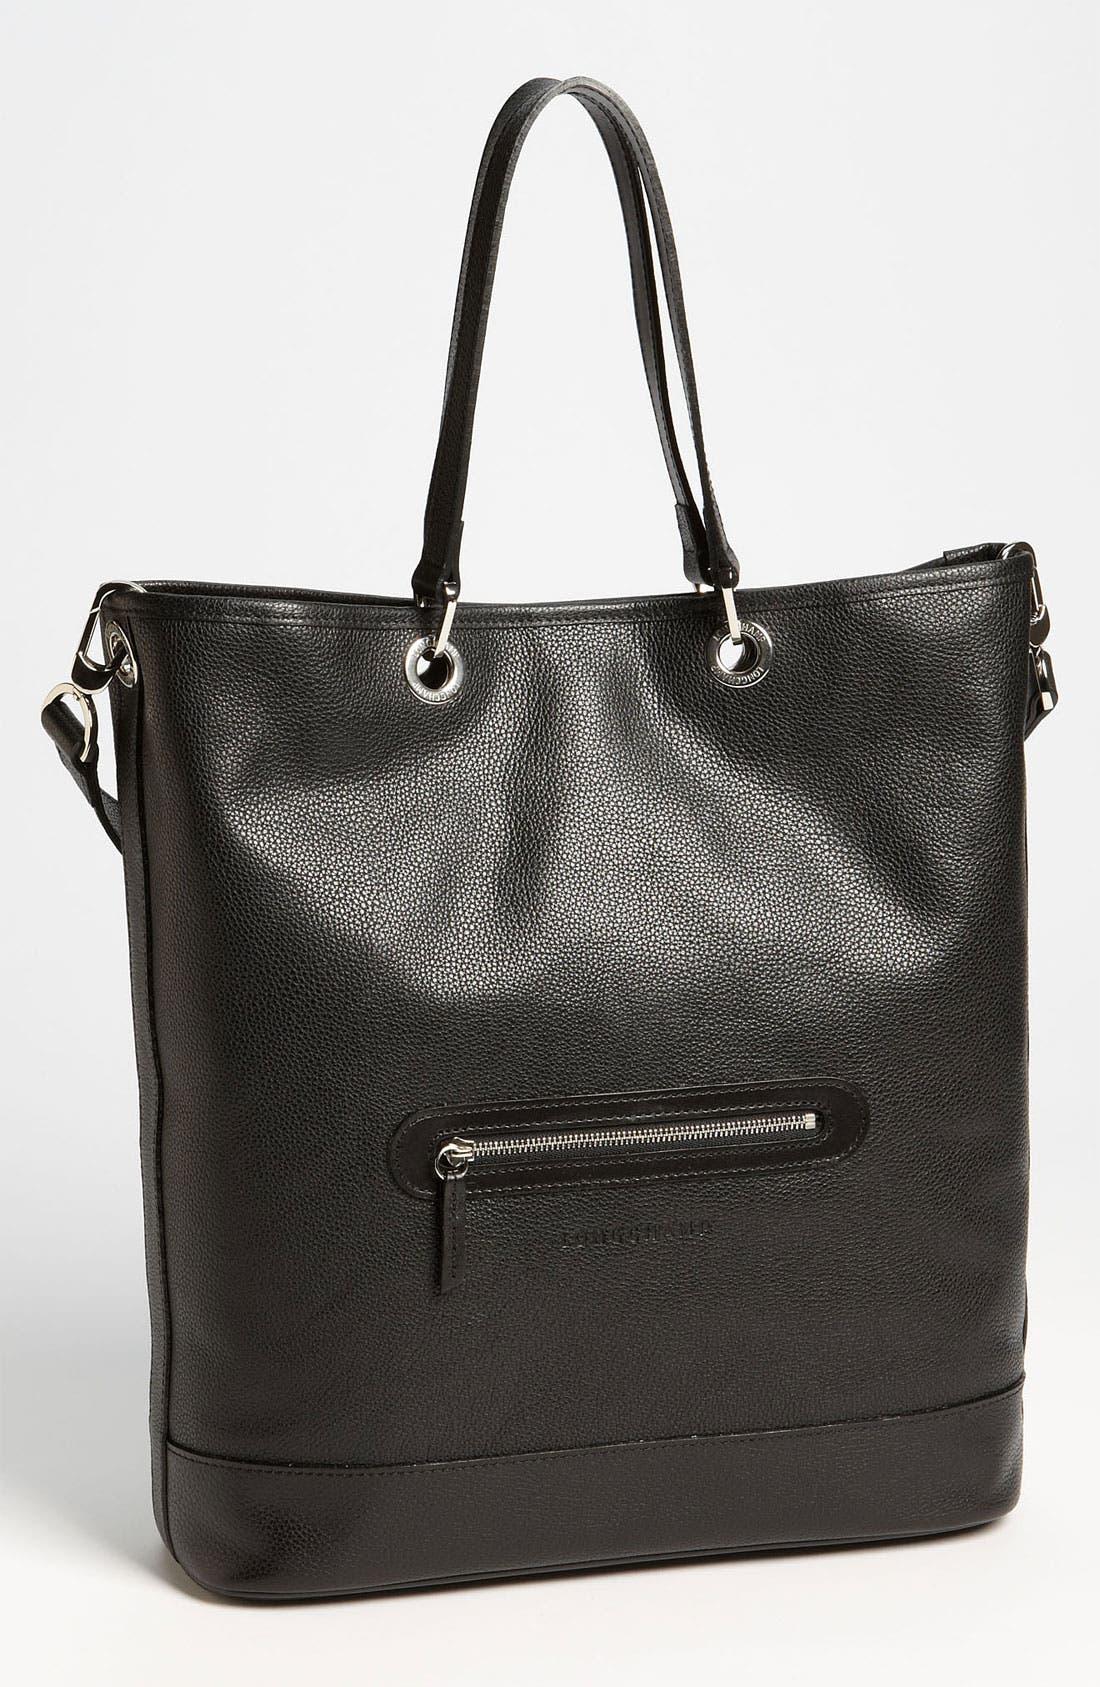 Main Image - Longchamp 'Veau Fouloneé' Leather Tote